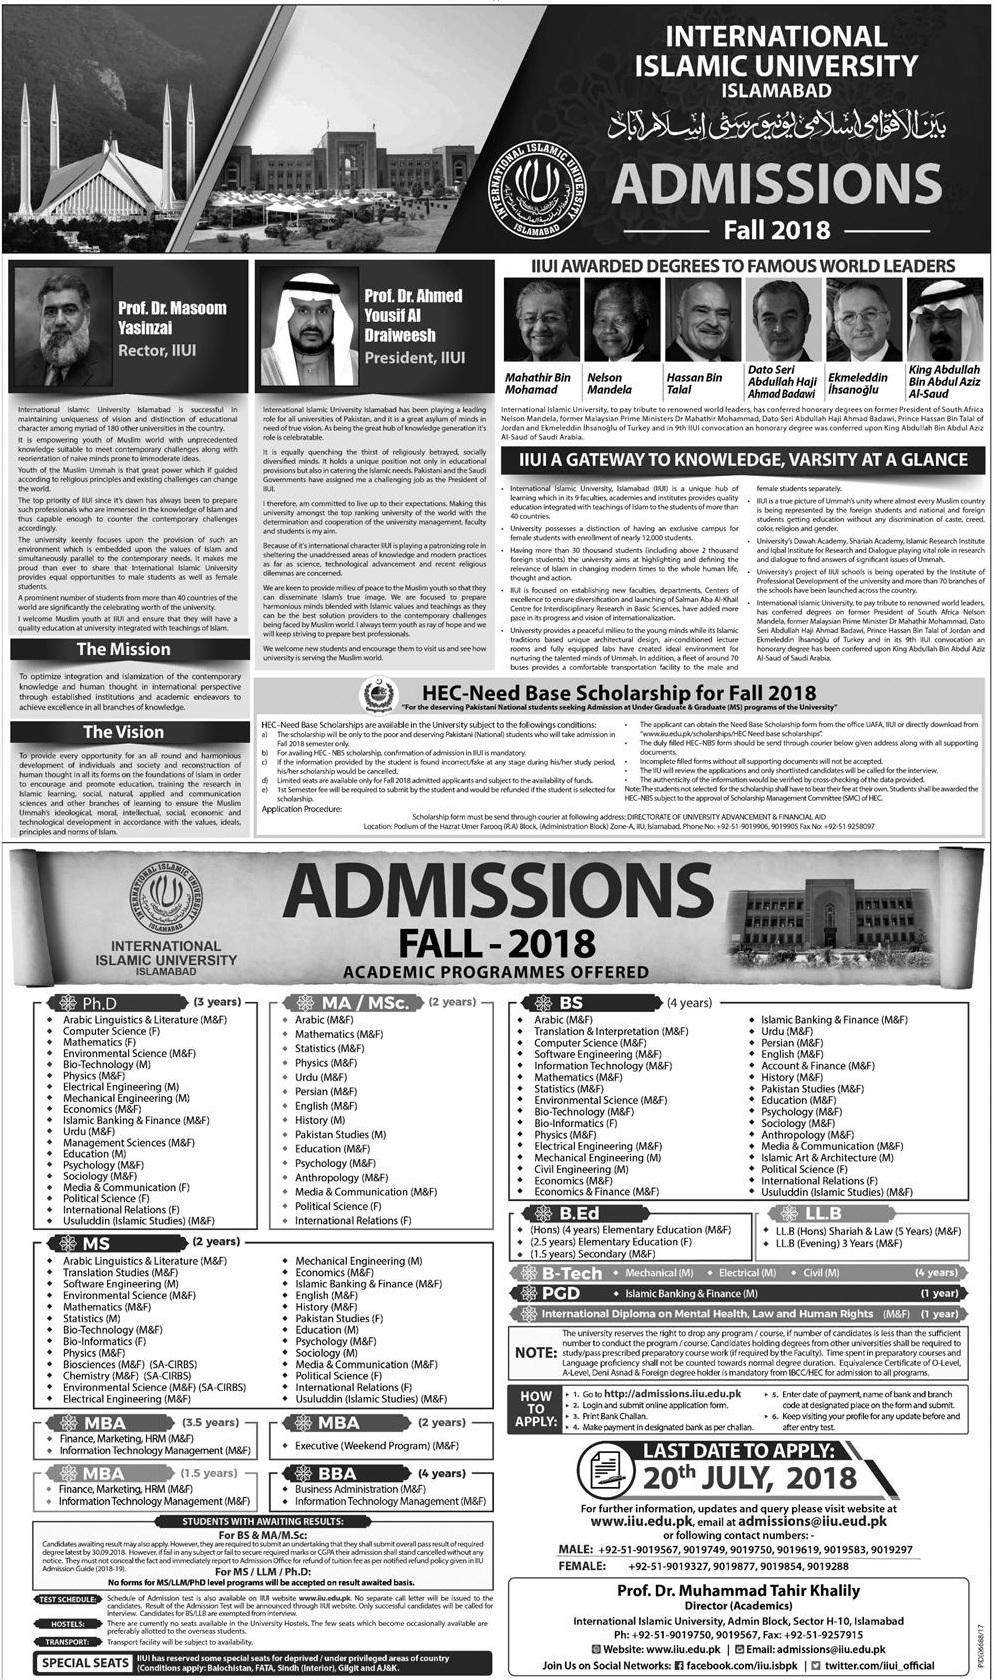 IIUI Admission Fall 2018 Download International Islamic University Admission Form